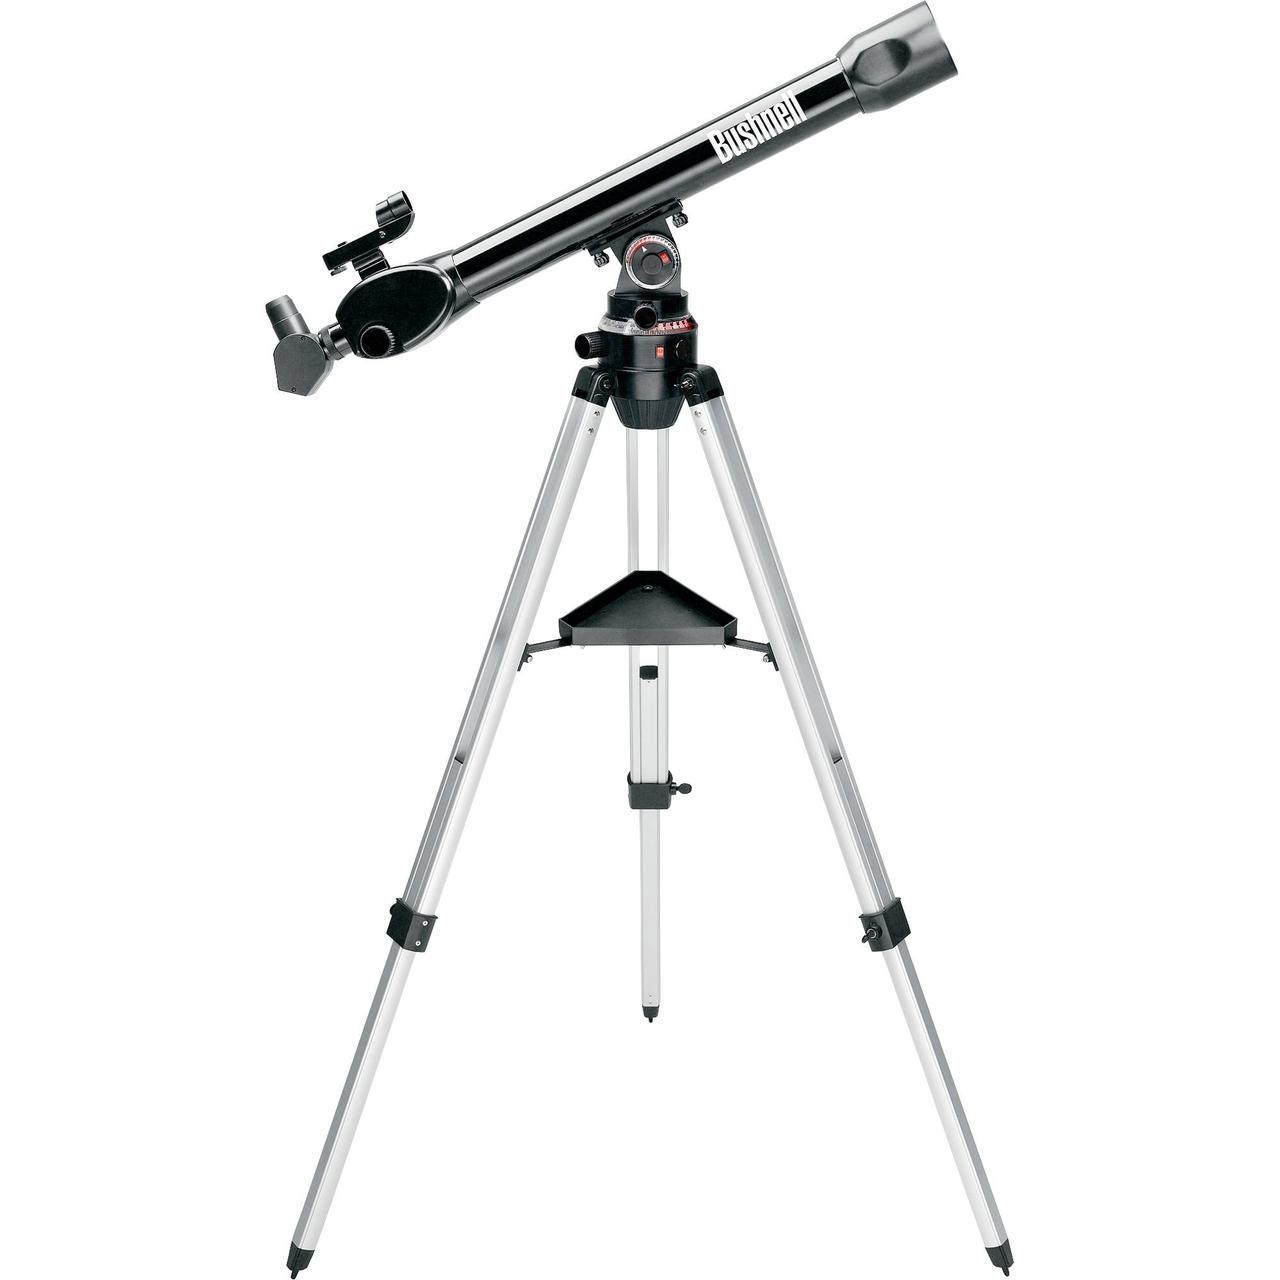 Телескоп рефракторный Bushnell Voyager with Sky Tour, Фокусное растояние: 700 мм, Диаметр объектива: 60 мм, Ув